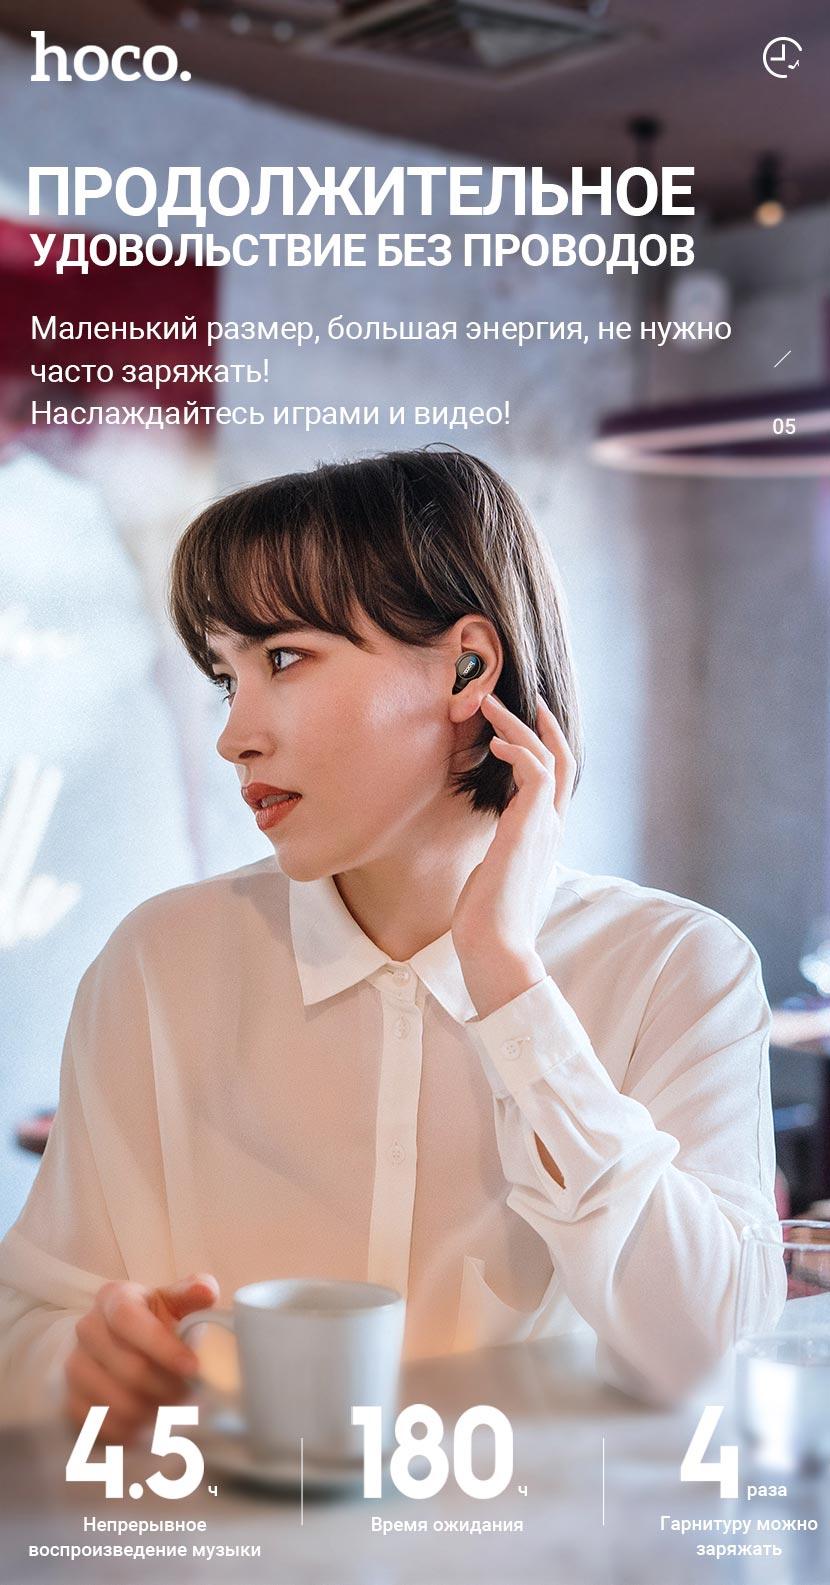 hoco news es52 delight tws wireless bt headset long lasting ru